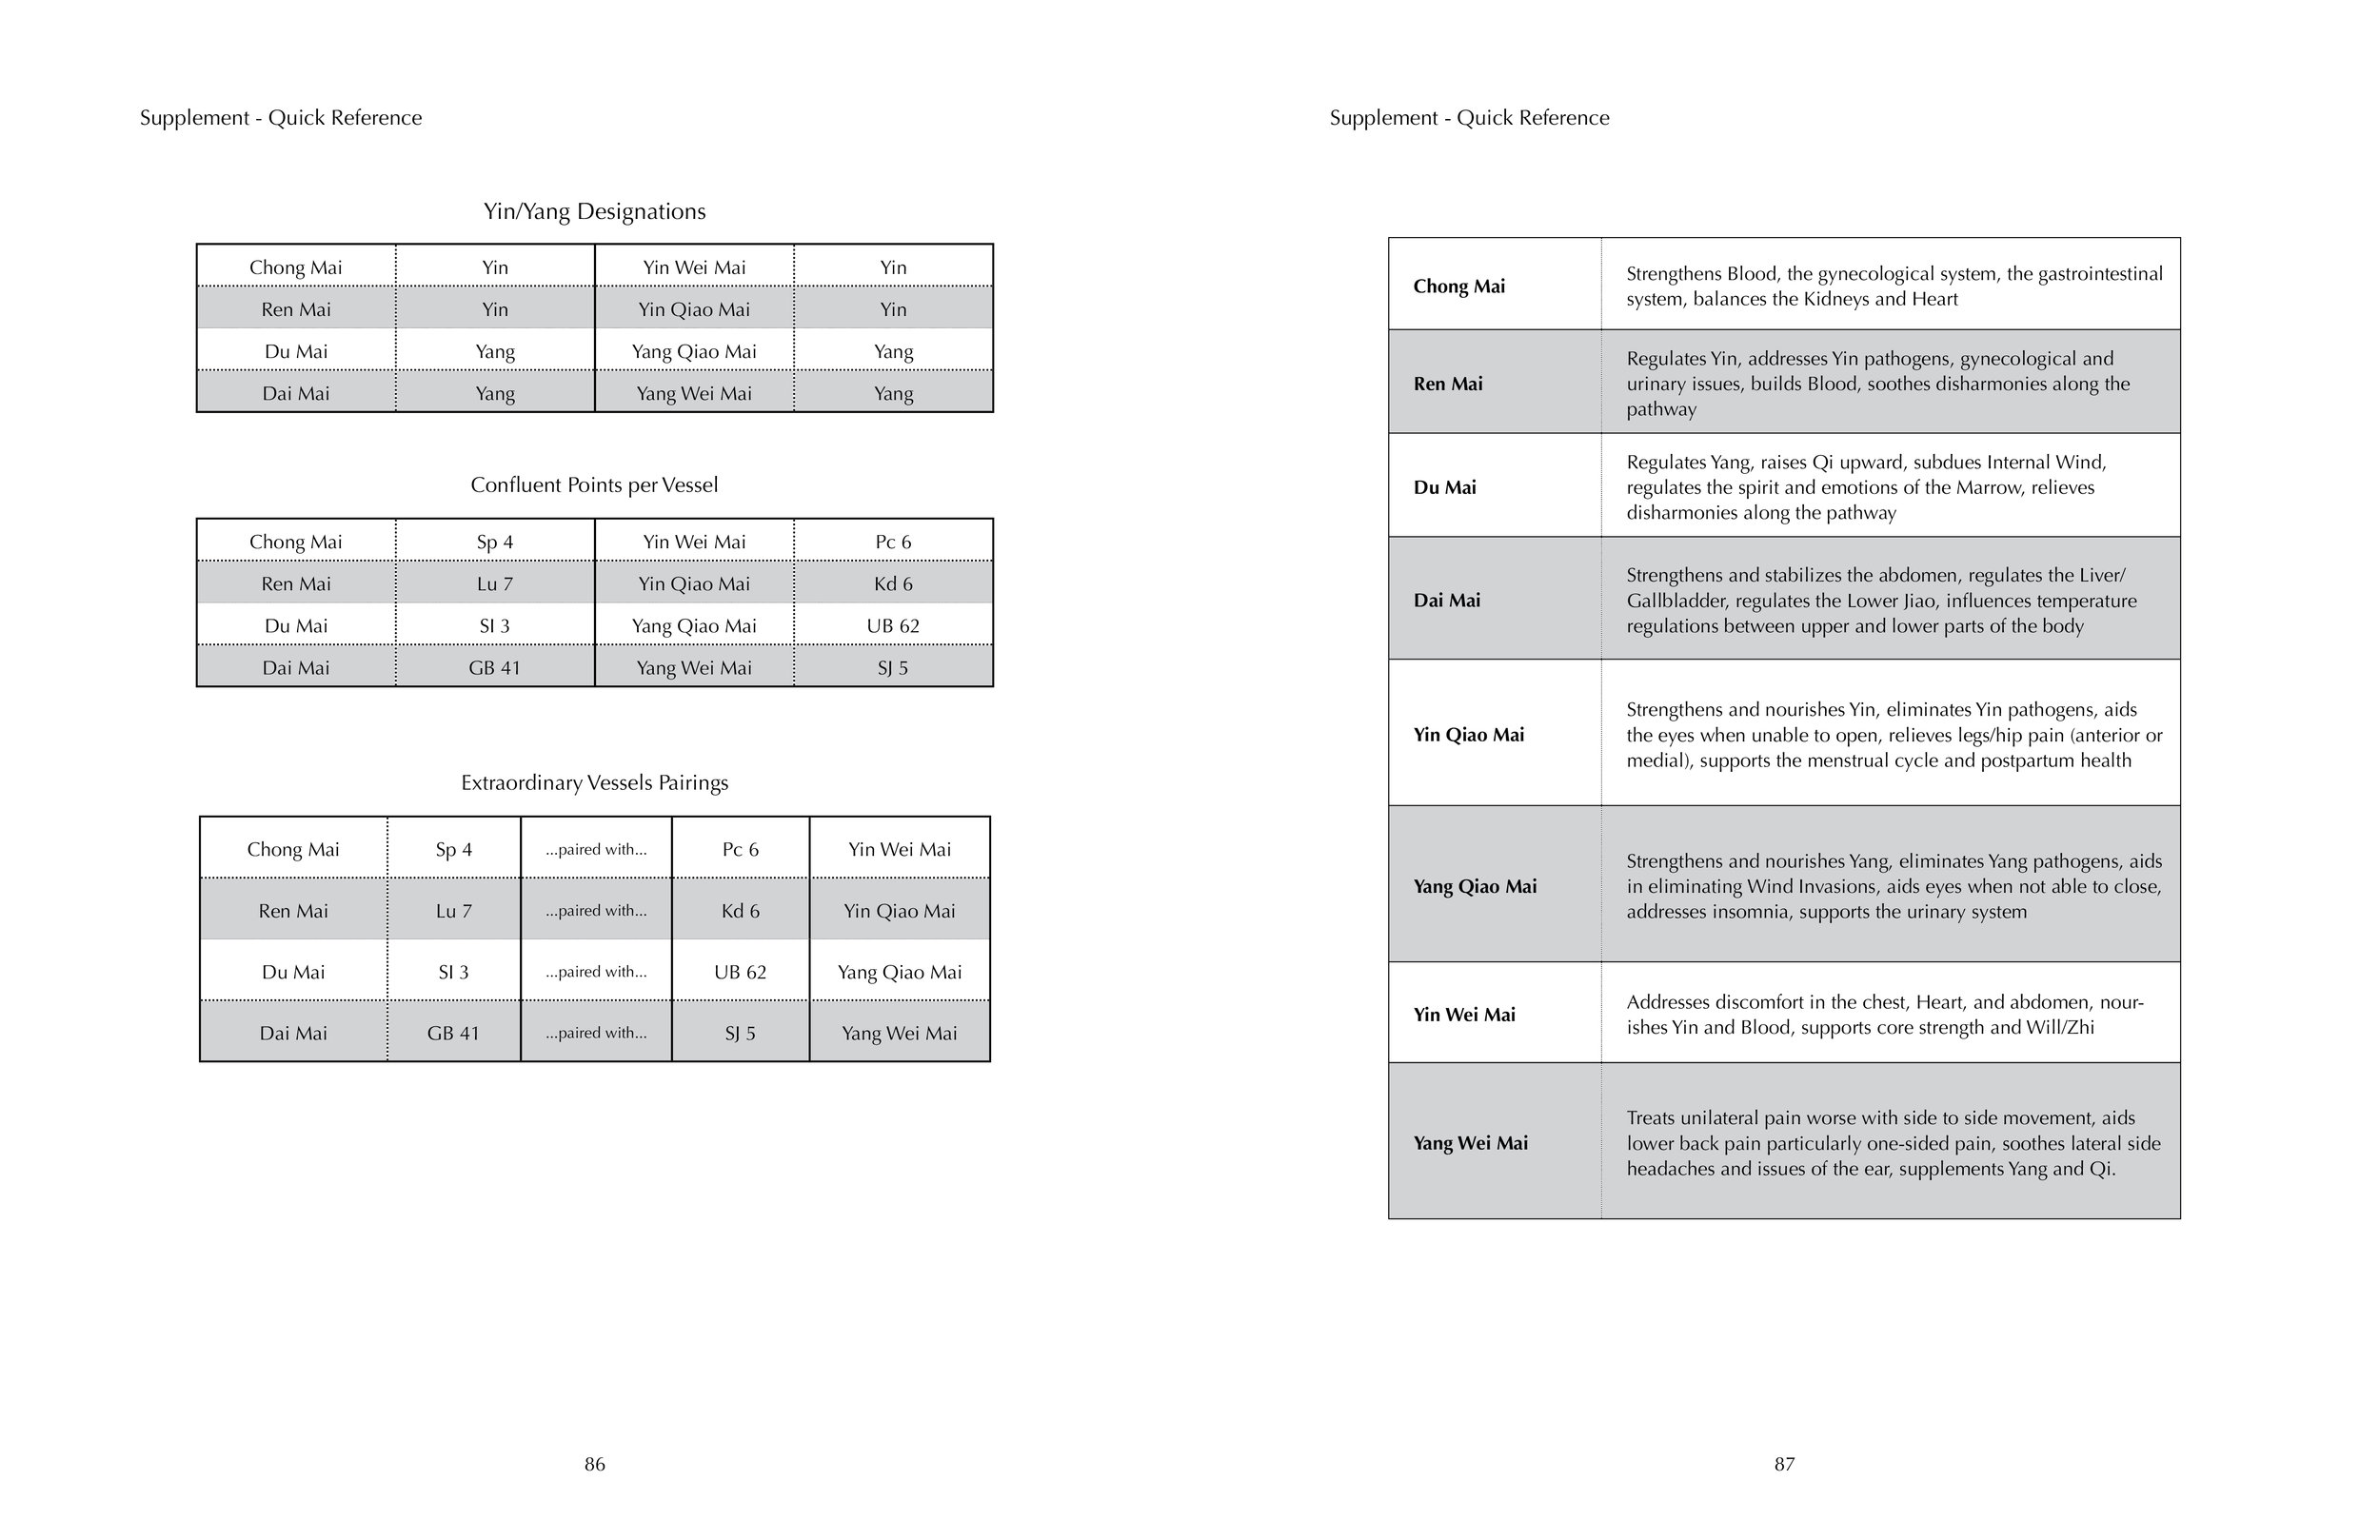 Extraordinary Vessels Handbook Charts